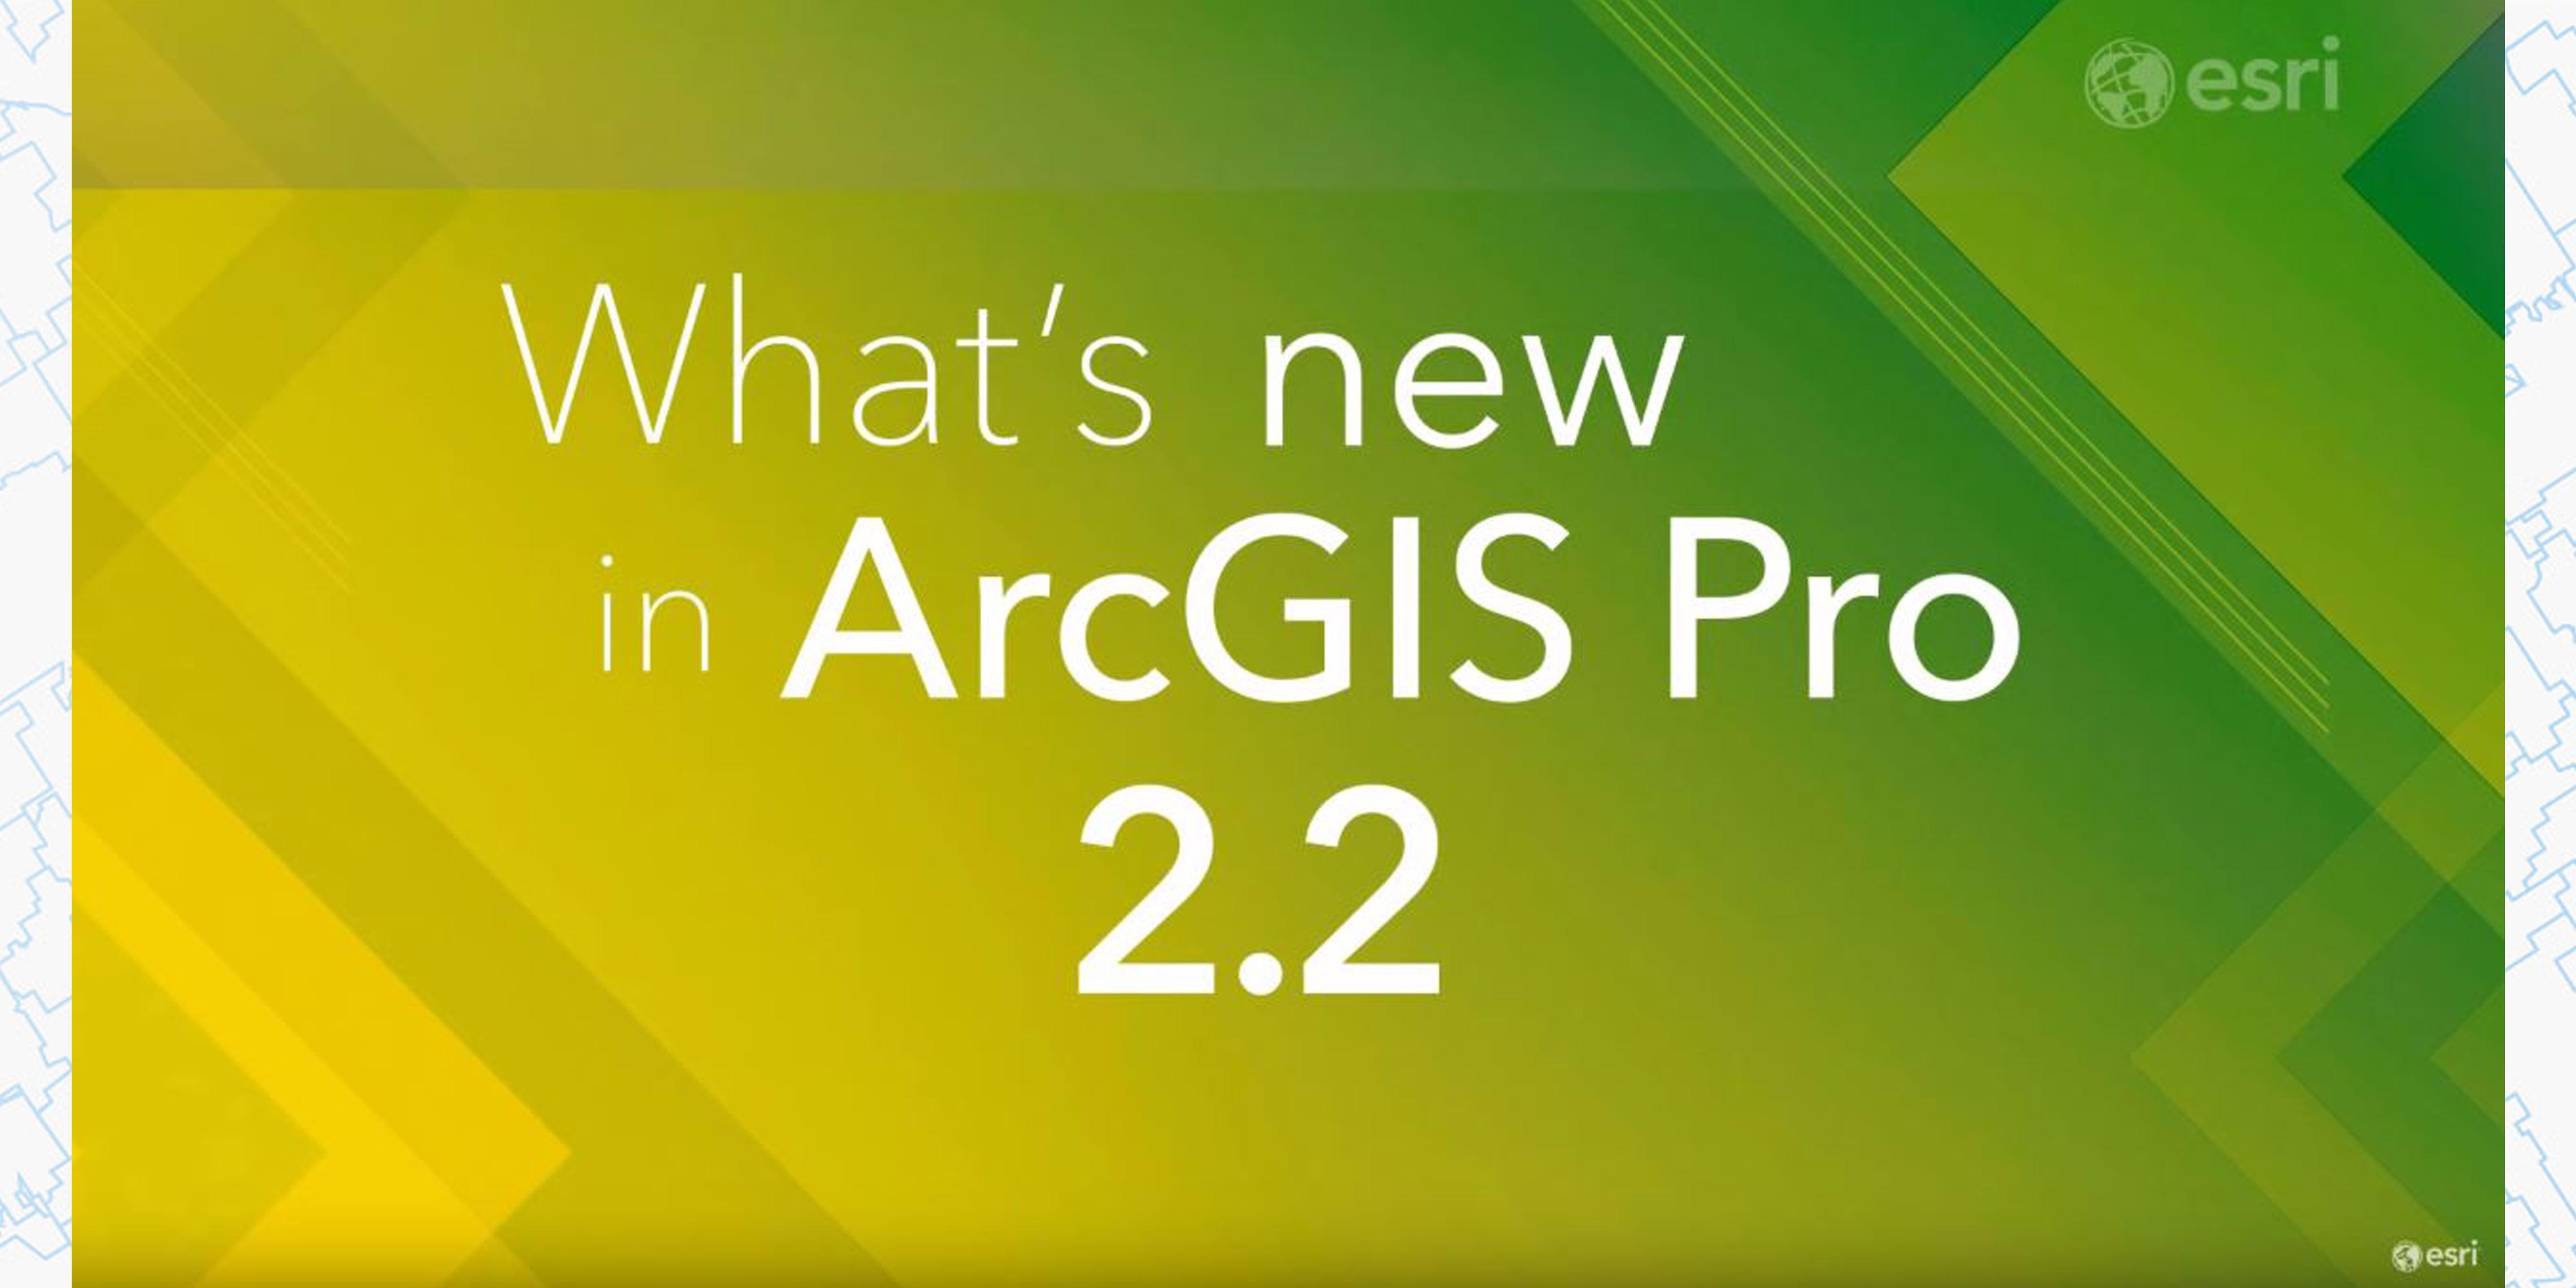 Novità ArcGIS Pro 2.2